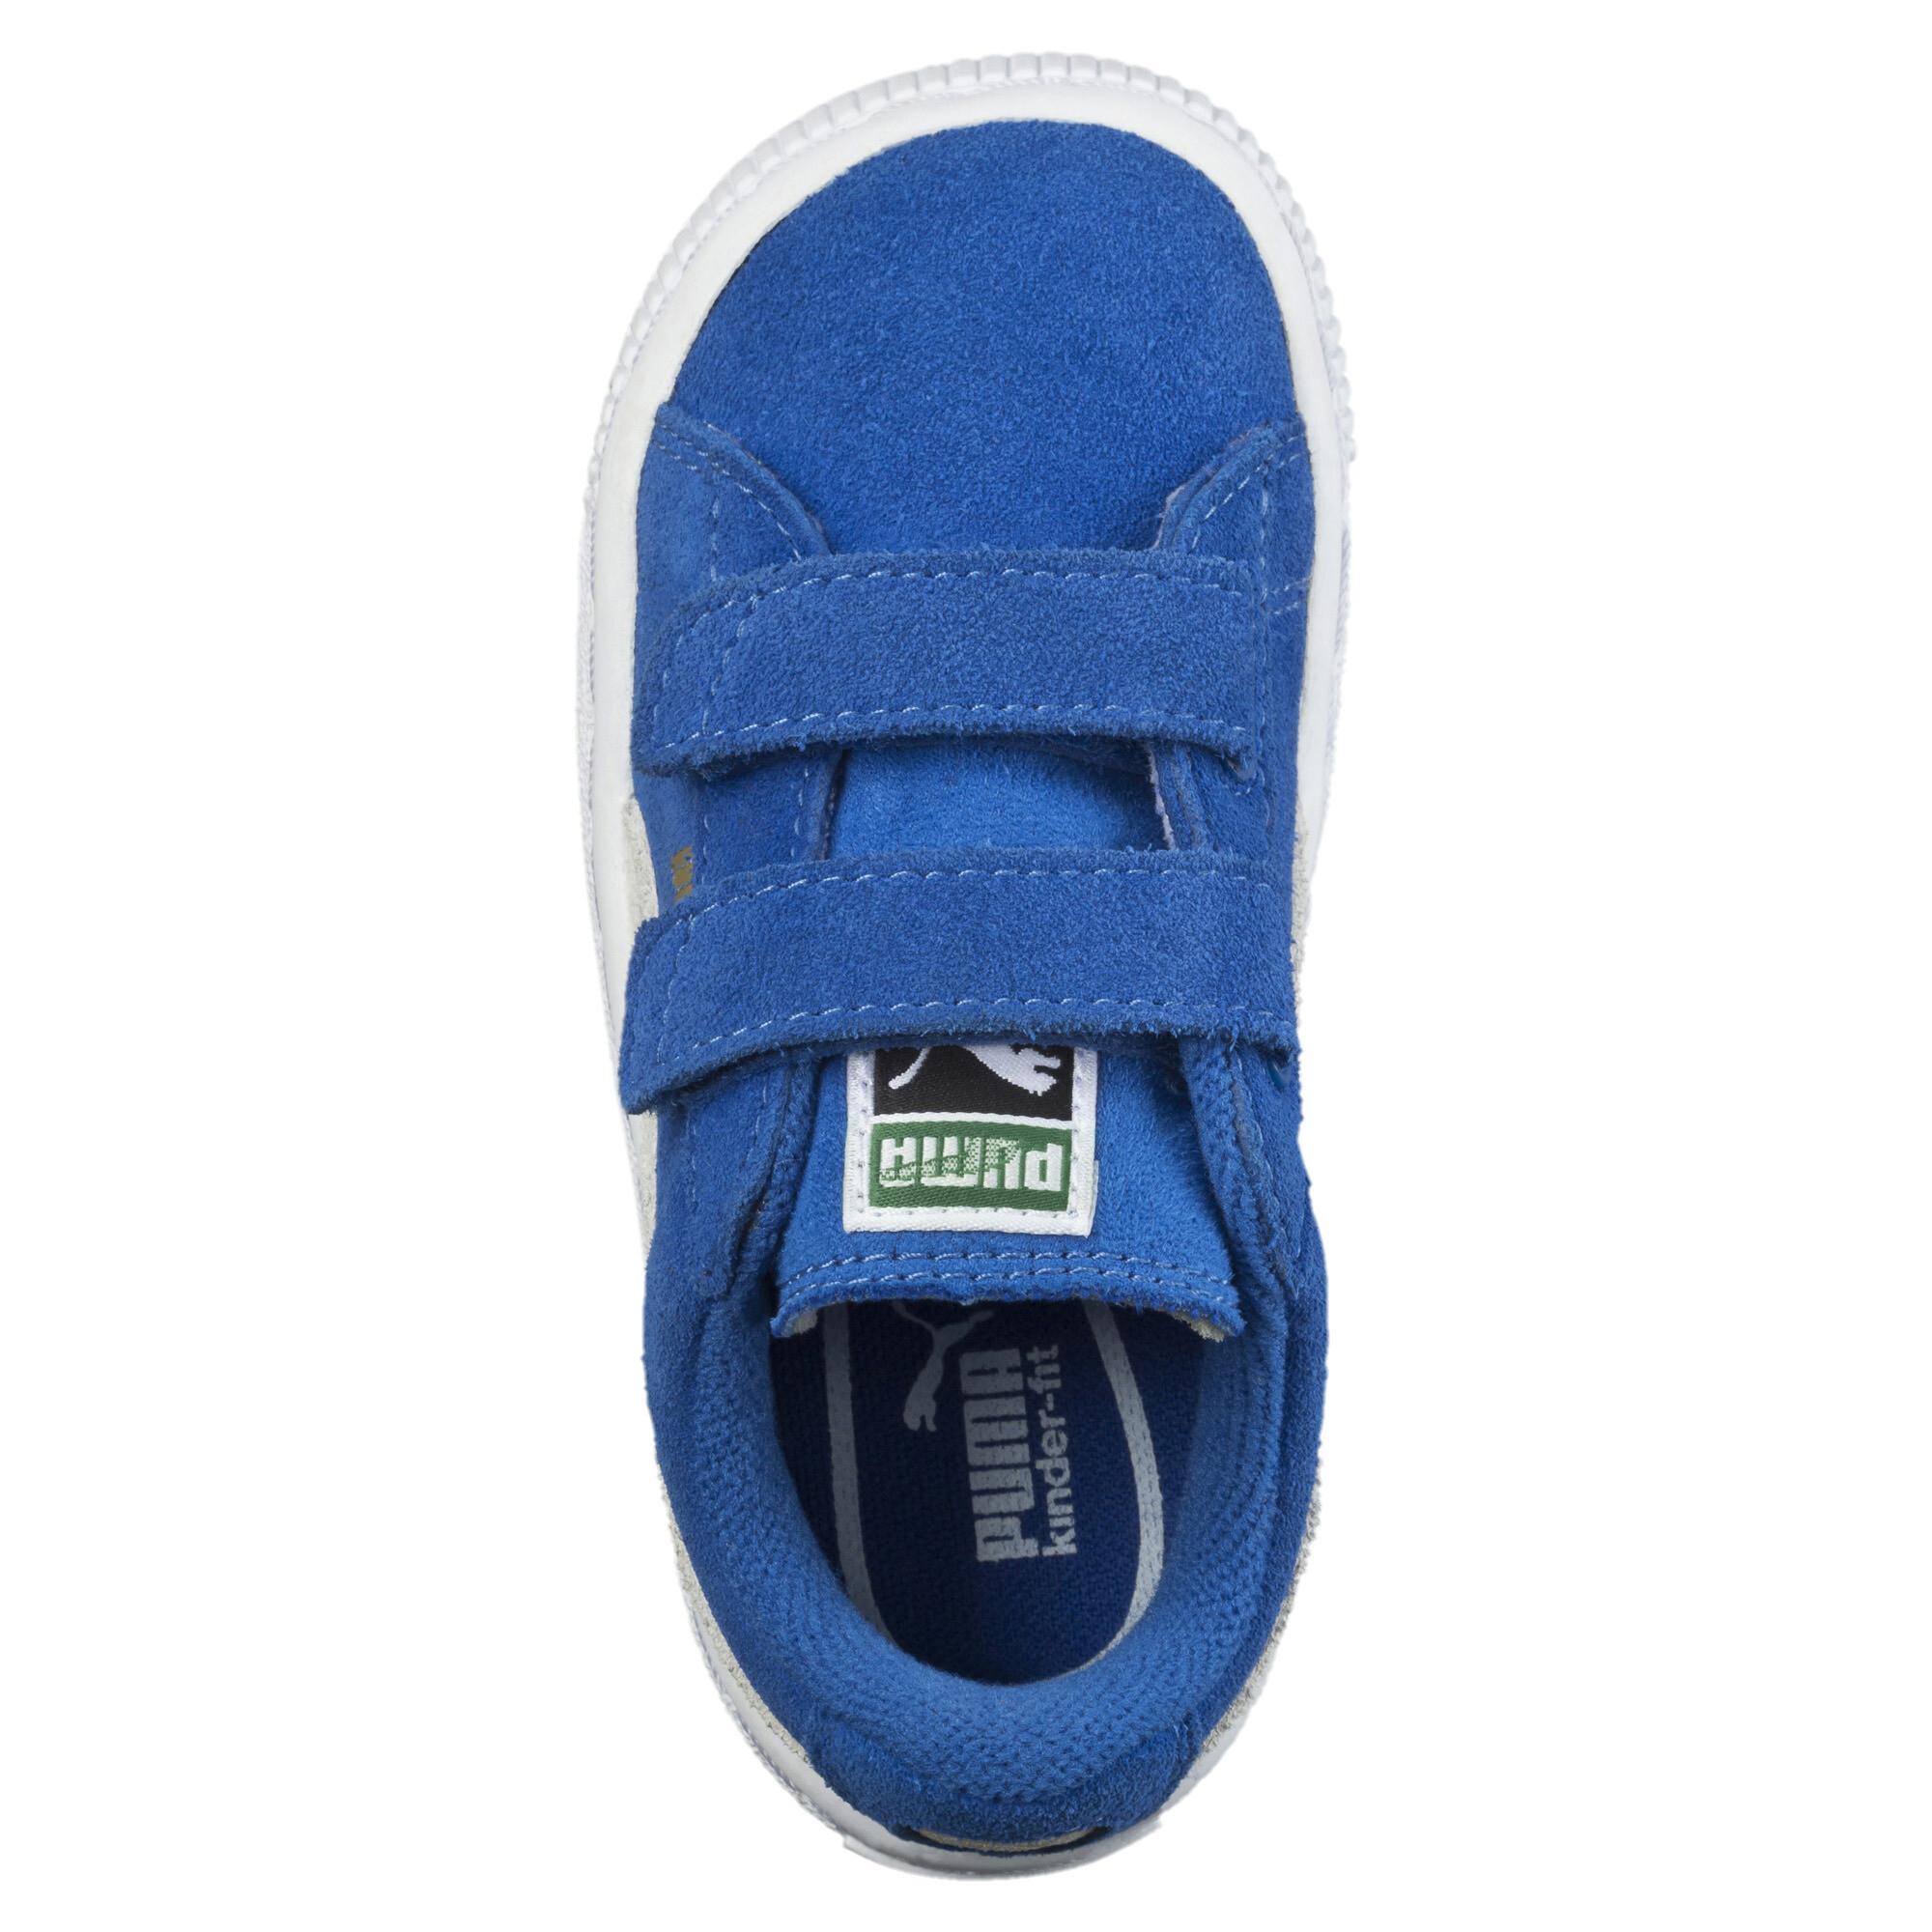 PUMA-Suede-AC-Toddler-Shoes-Kids-Shoe-Kids thumbnail 16